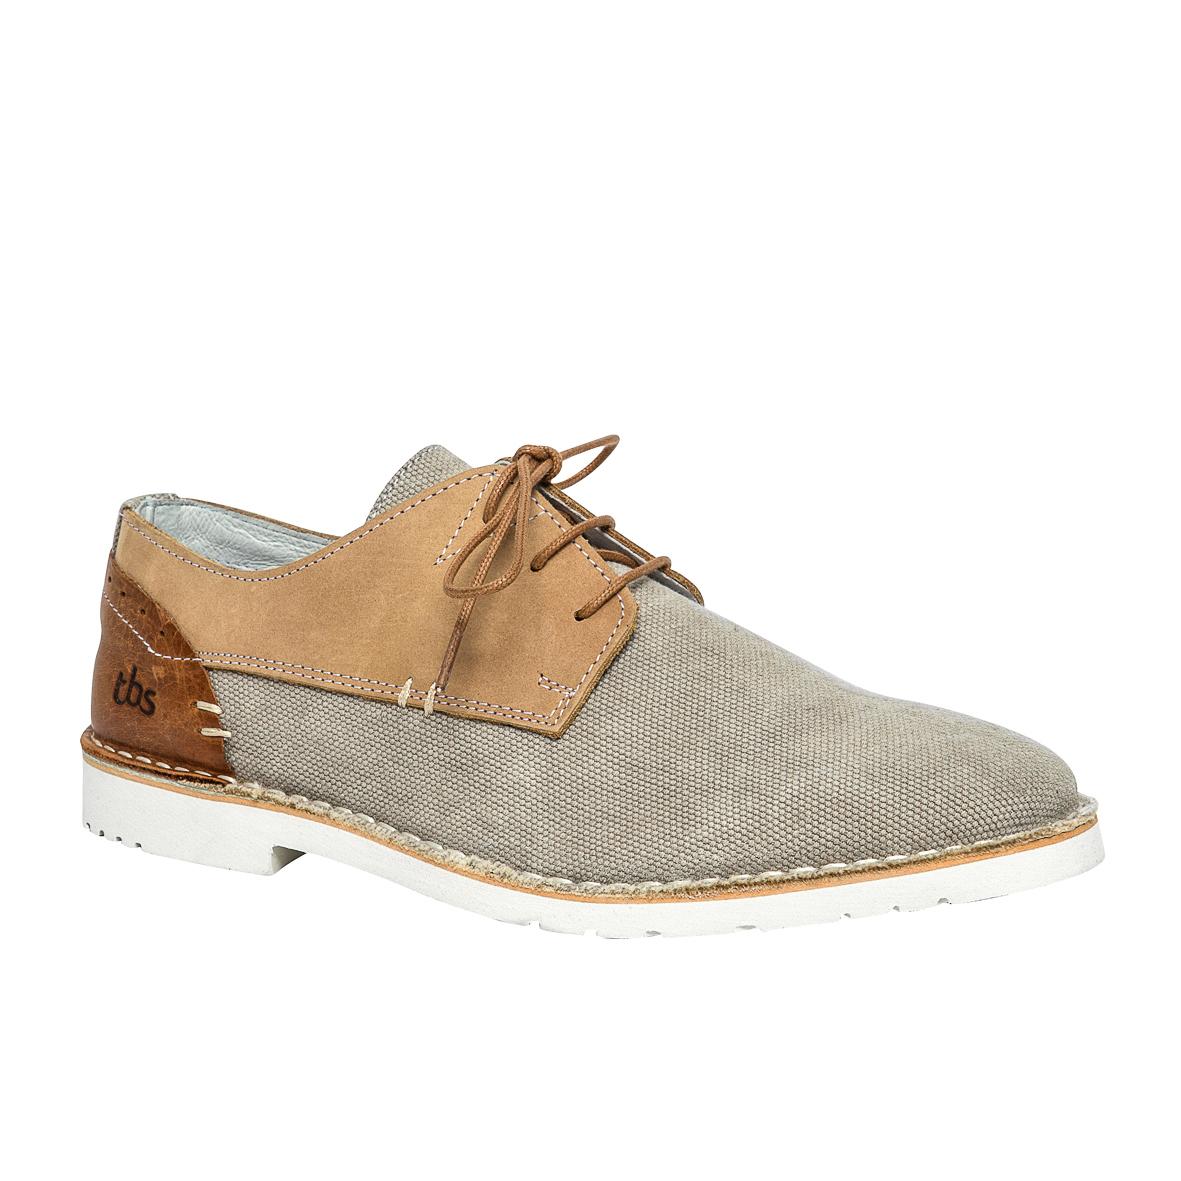 Полуботинки мужские. DAYVON-3847DAYVON-3847Ботинки класса-комфорт. Модель на шнуровке.